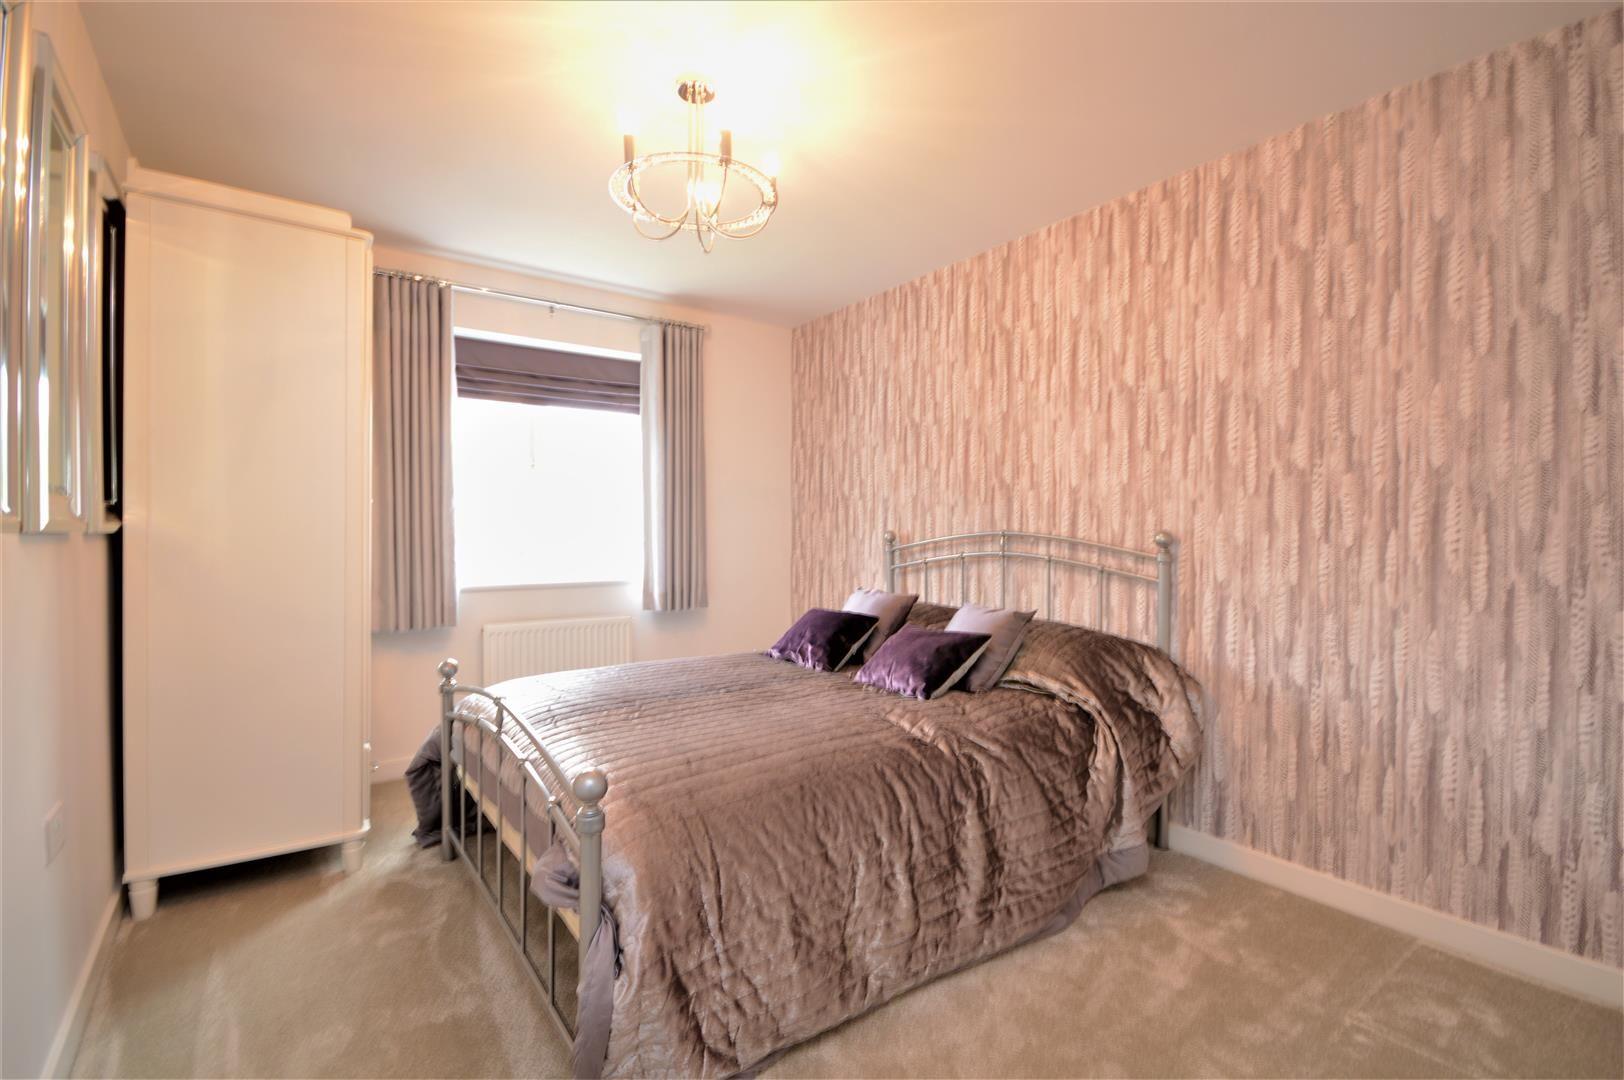 4 bed detached for sale in Bartestree  - Property Image 12